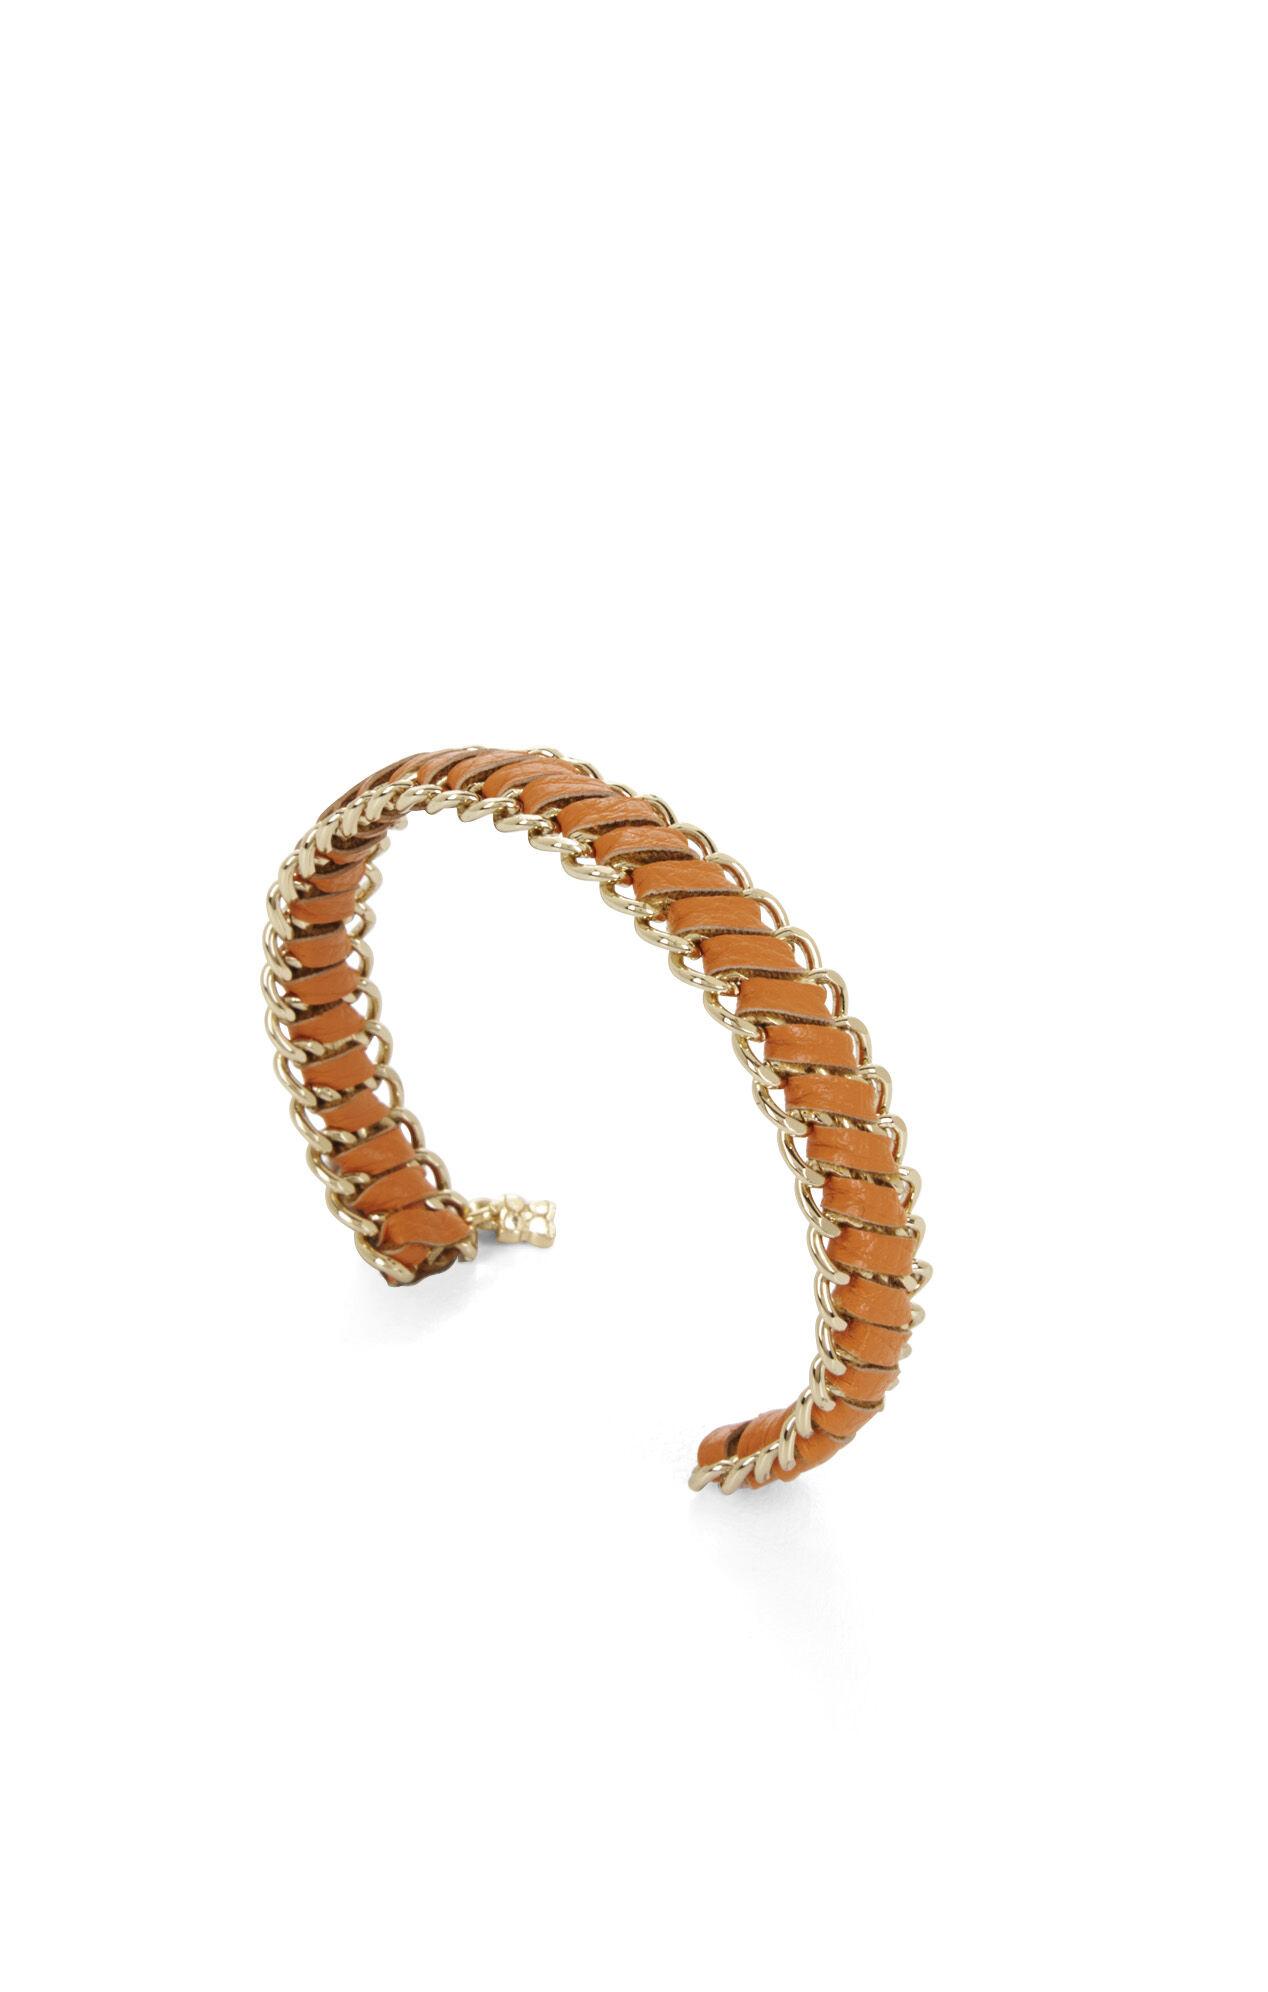 Woven Chain Cuff